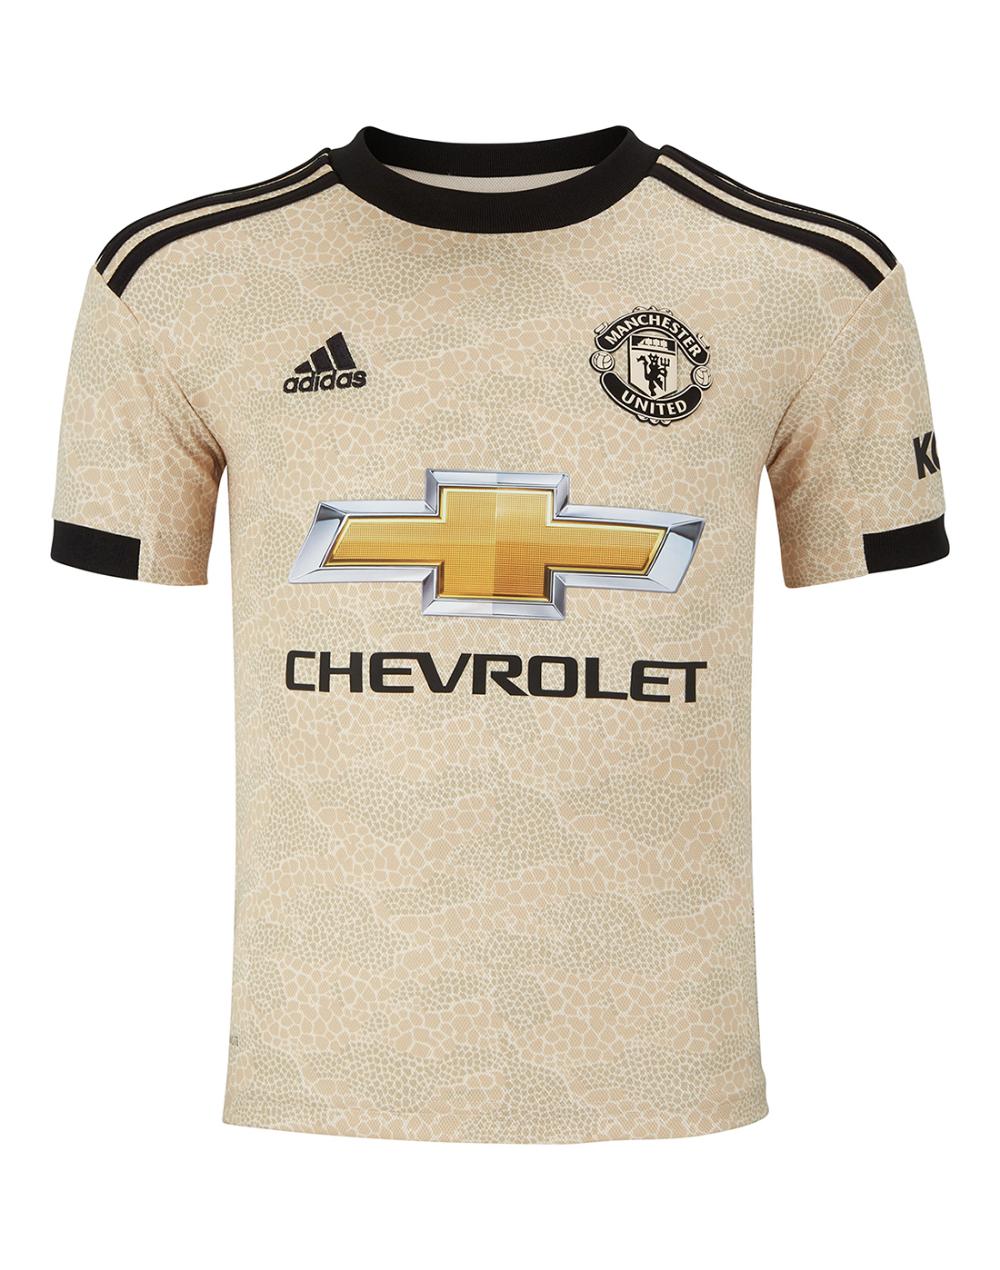 adidas Kids Man Utd Away 1920 Jersey | Football shirts